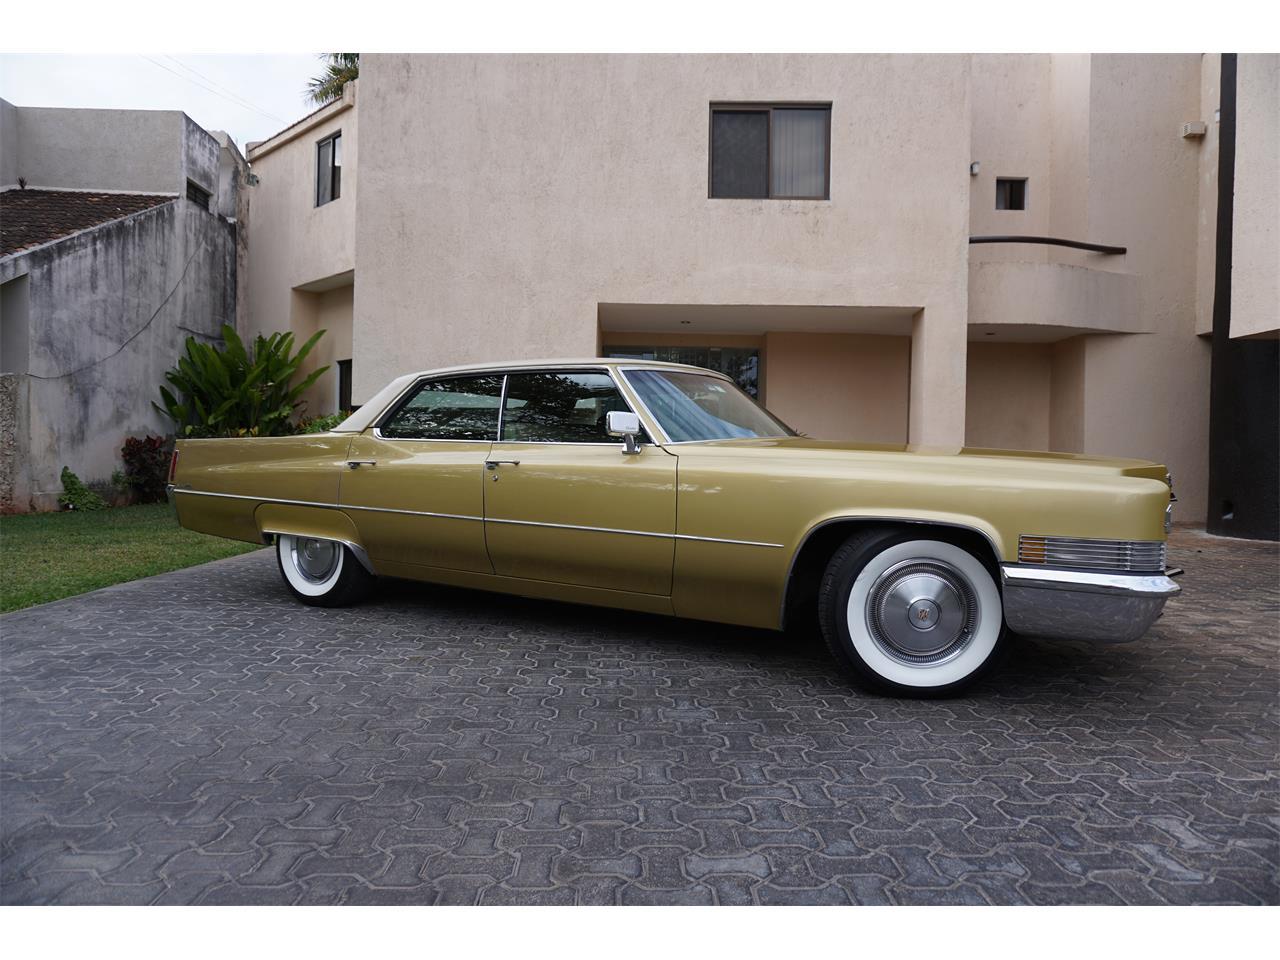 1970 cadillac sedan deville for sale classiccars com cc 1069948large picture of \u002770 sedan deville mxks